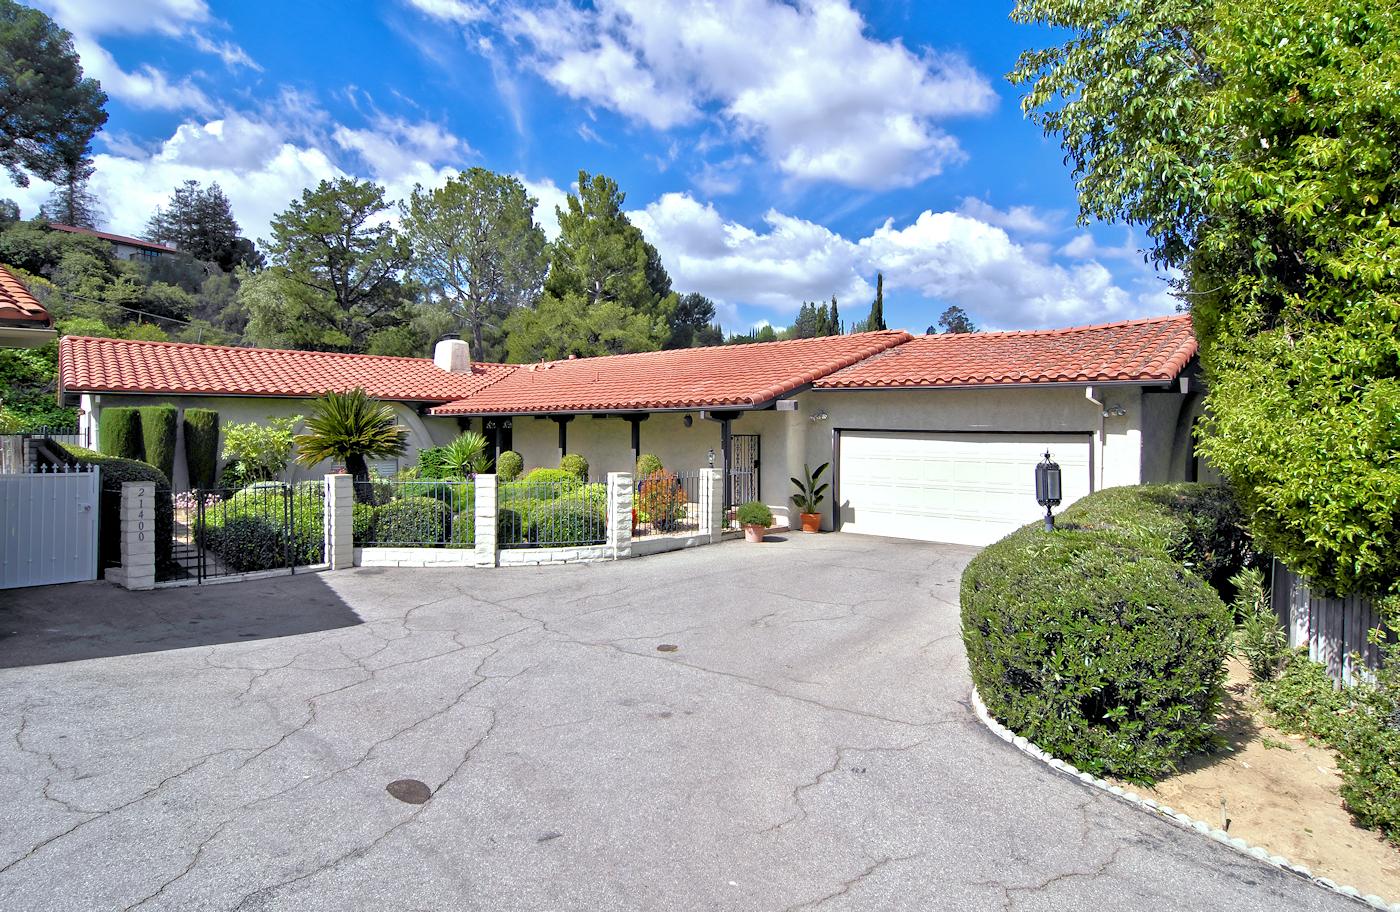 21400 Mulholland Dr Woodland Hills, CA 91364